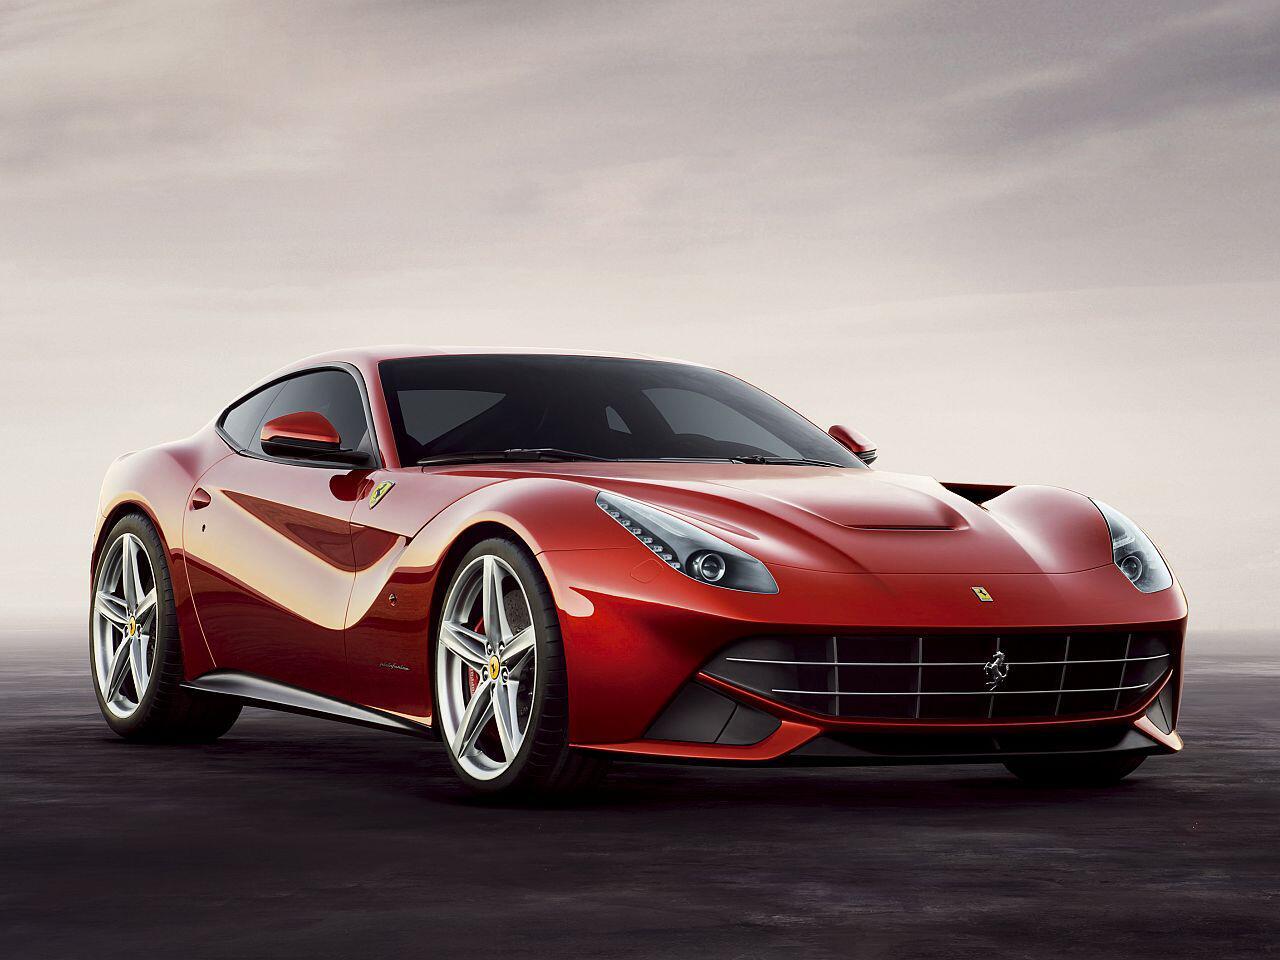 Bild zu Ferrari F12 Berlinetta